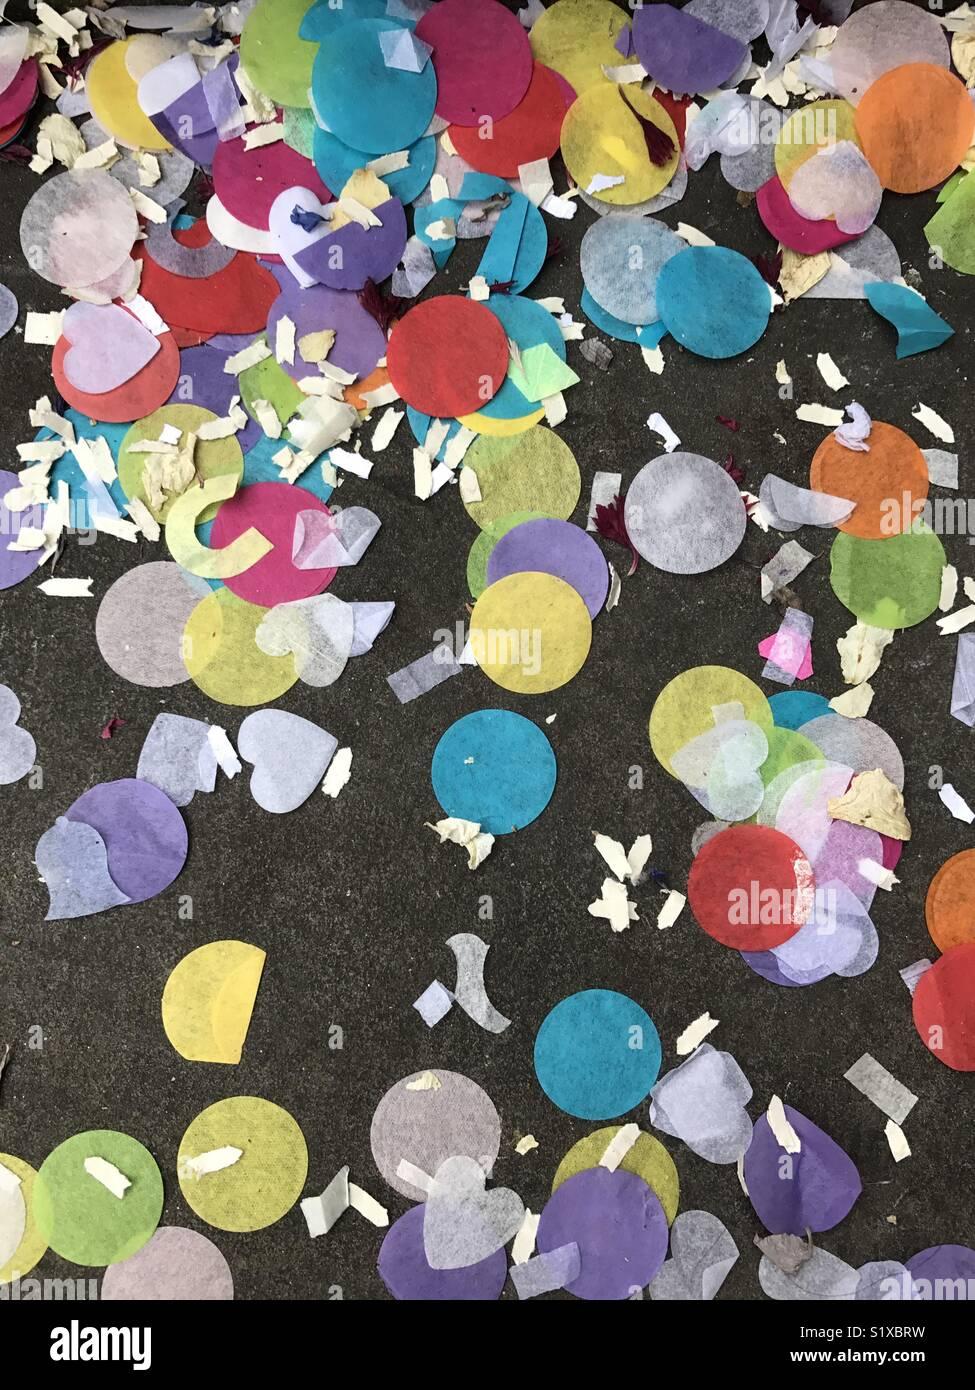 Confetti on a street - Stock Image